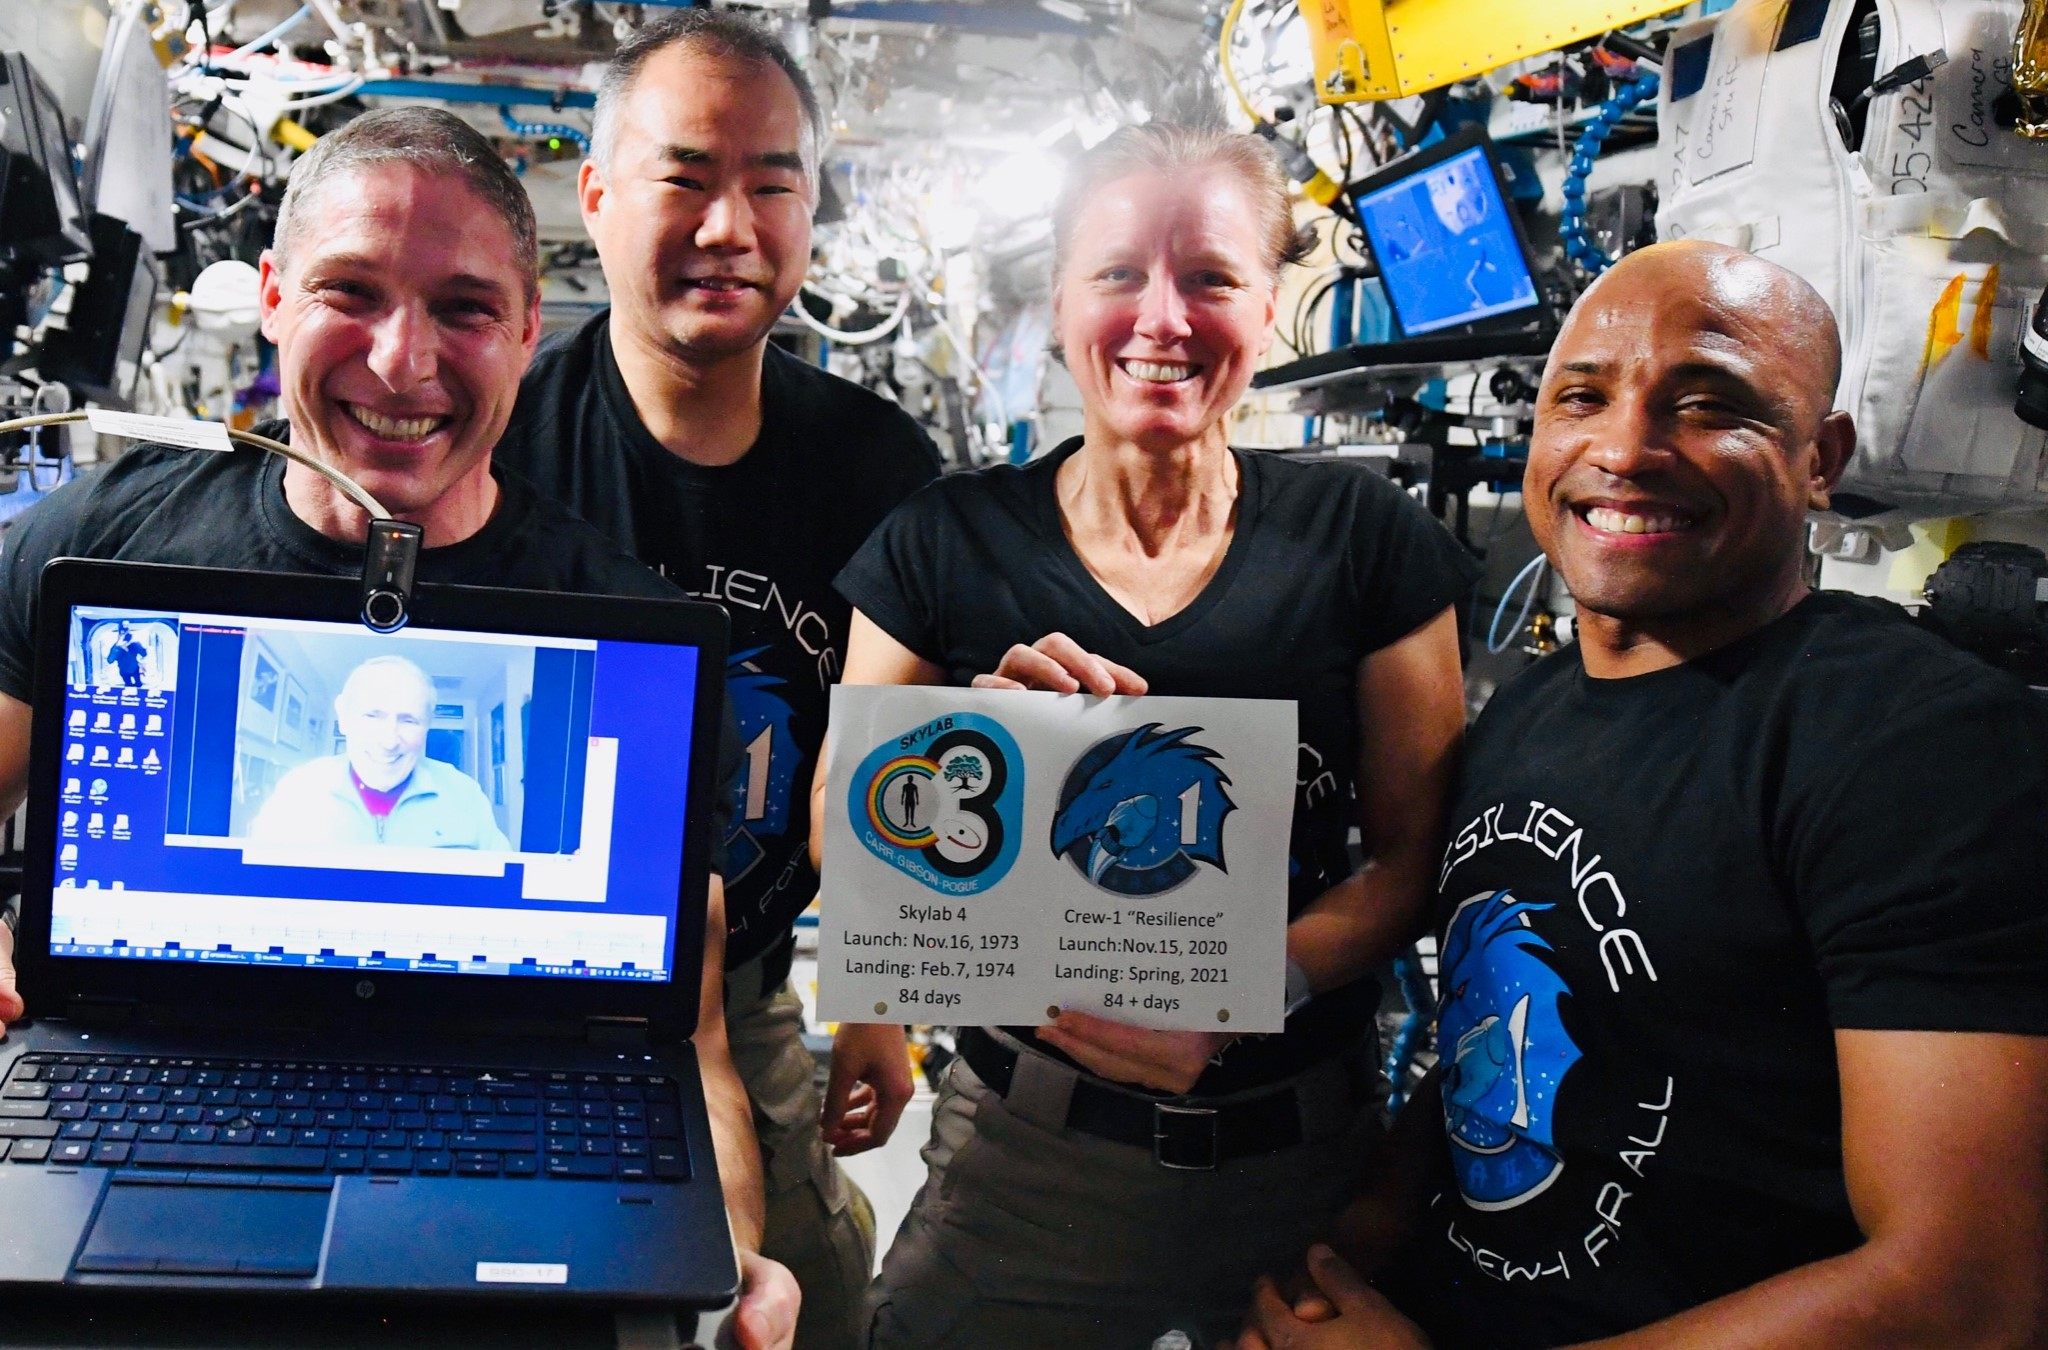 Crew Dragon C207 Crew-1 ISS 020721 (NASA) Hopkins Glover Noguchi Walker 1 crop